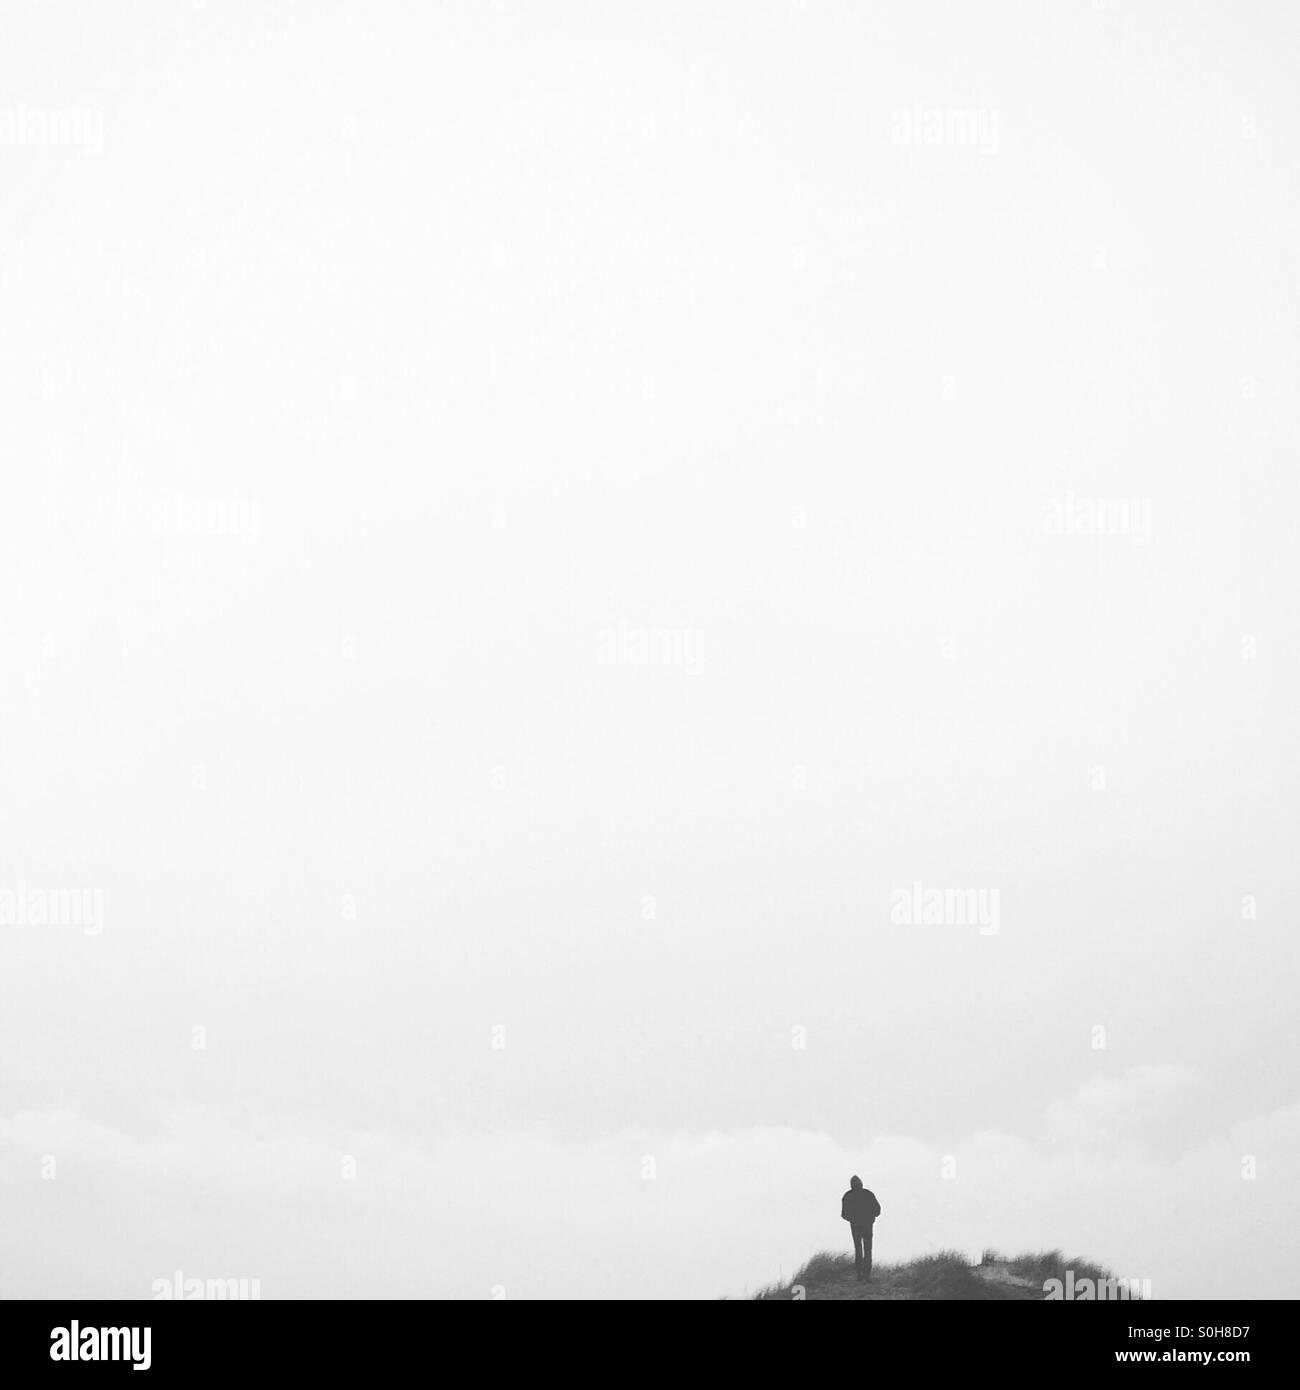 Cloud surfer - Stock Image